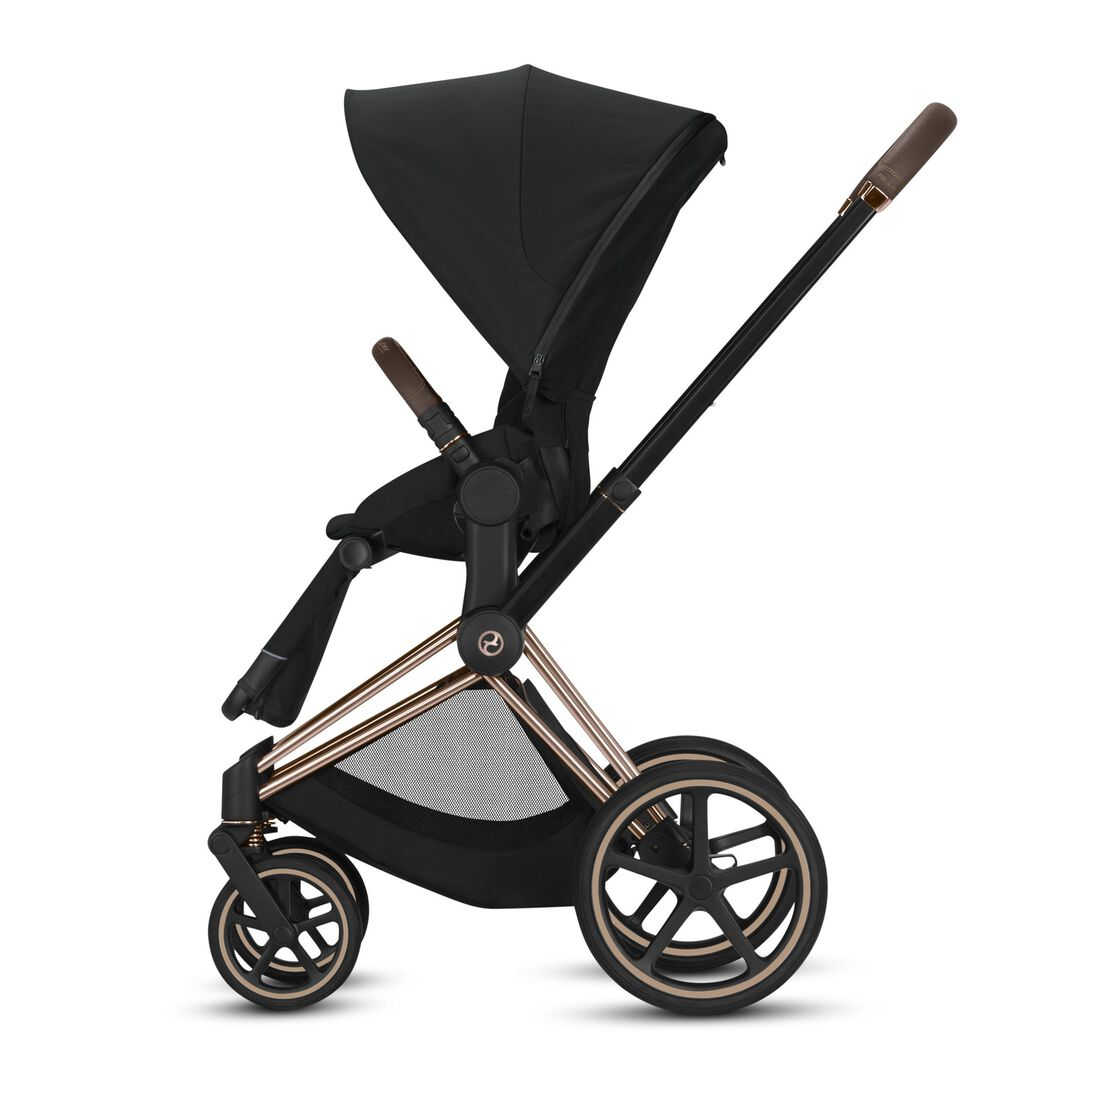 CYBEX TALOS S Lux - Black Frame - Luxurious Seat